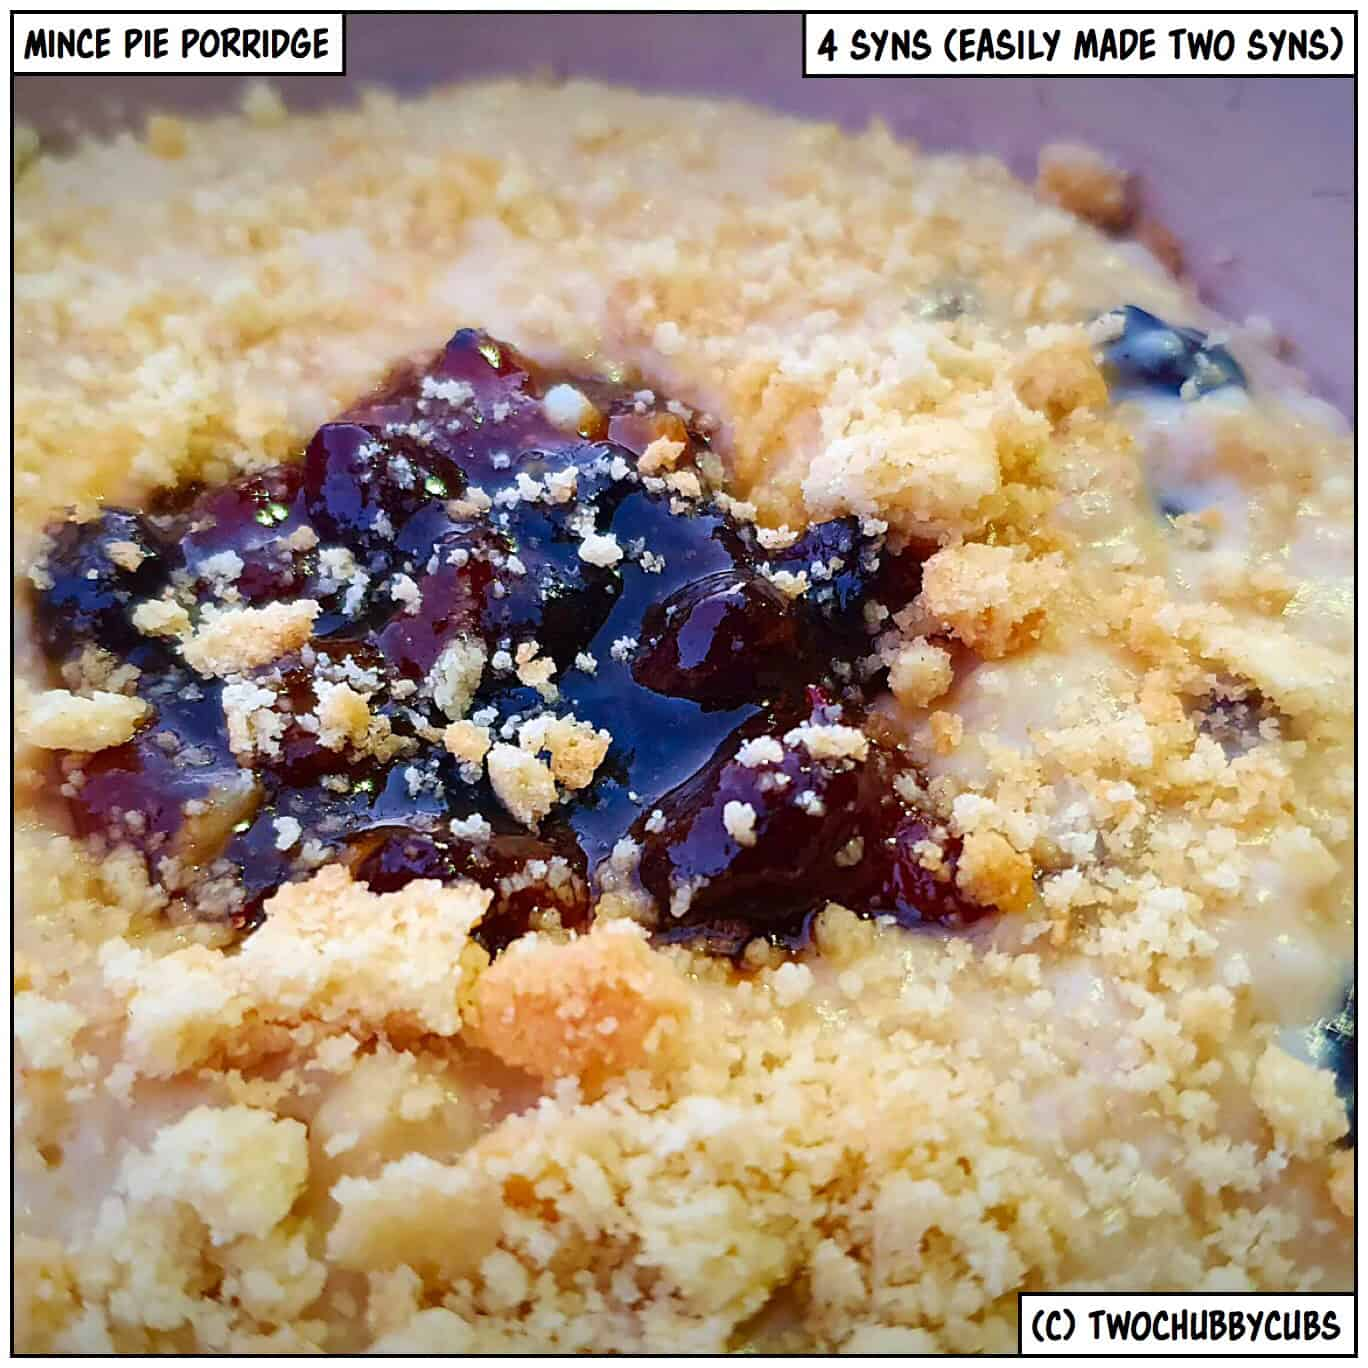 Mice Pie Porridge Christmas Breakfast Awaits